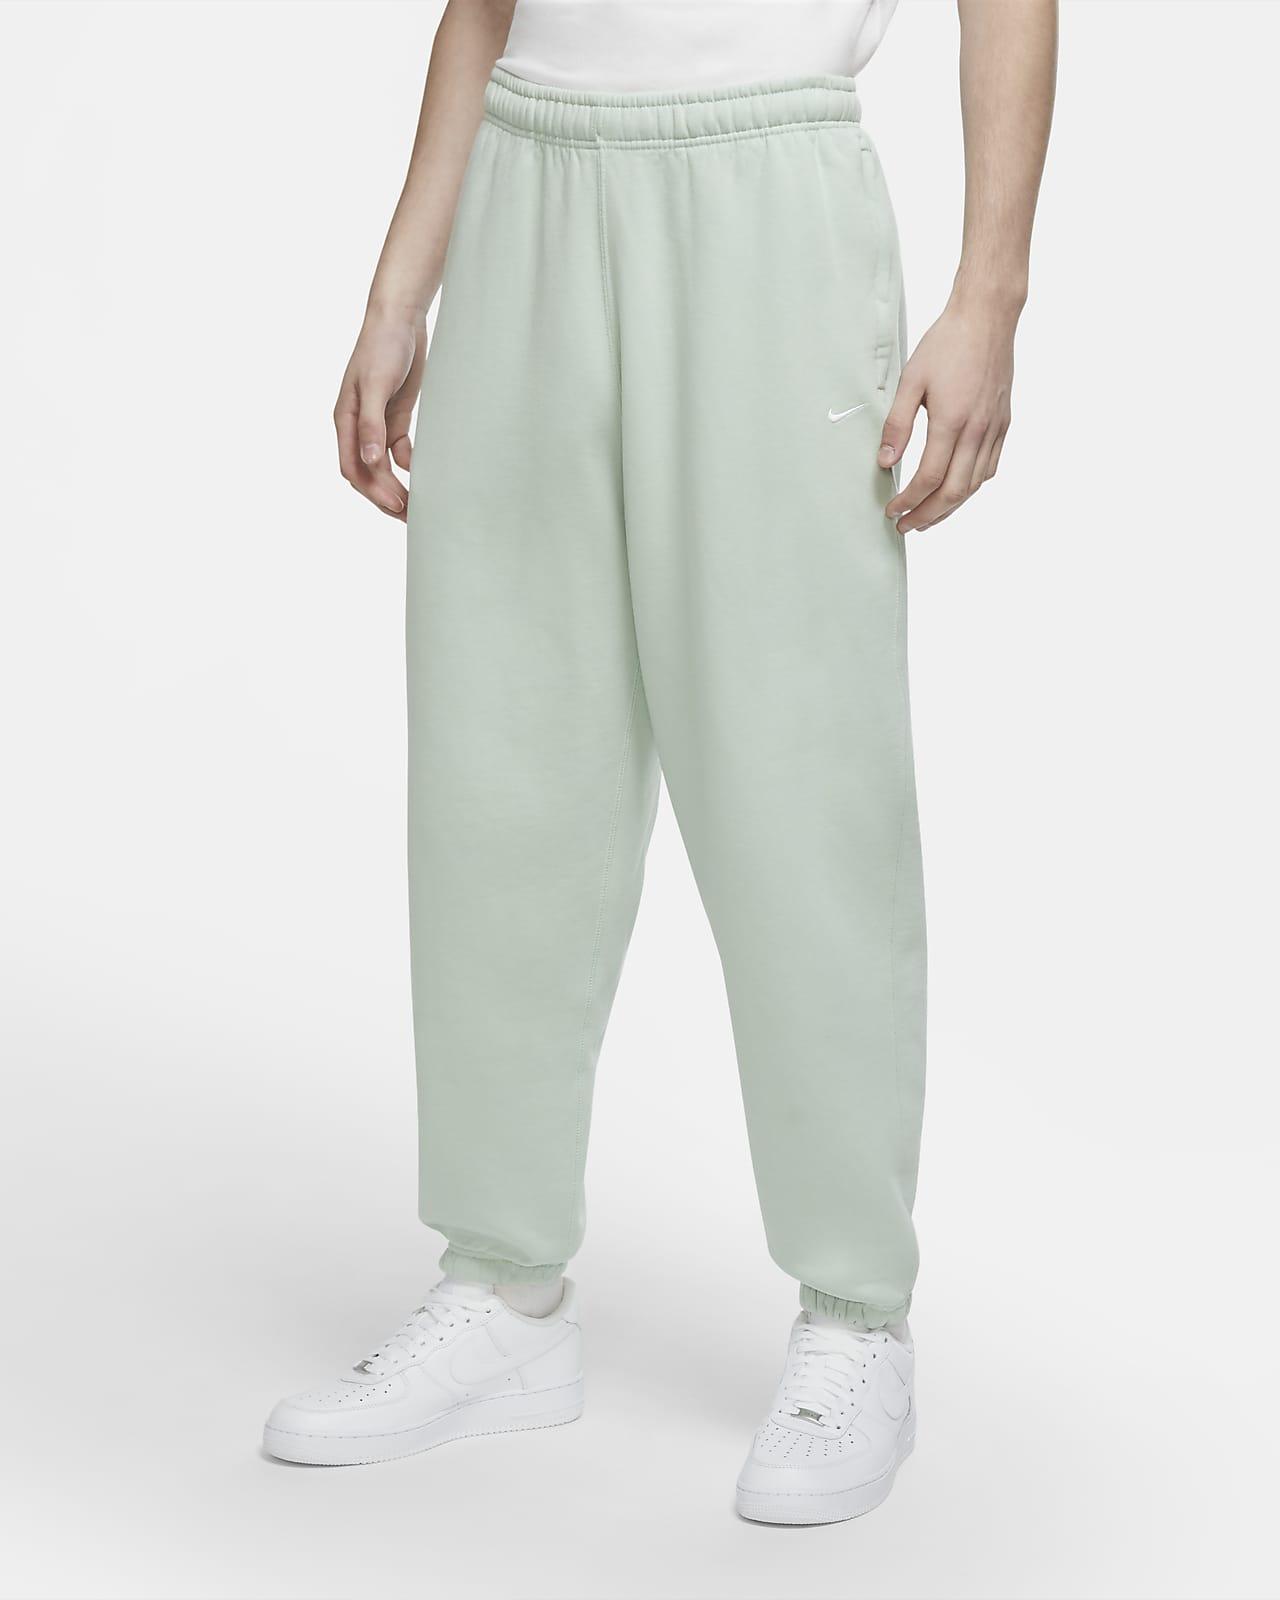 NikeLab Men's Washed Trousers